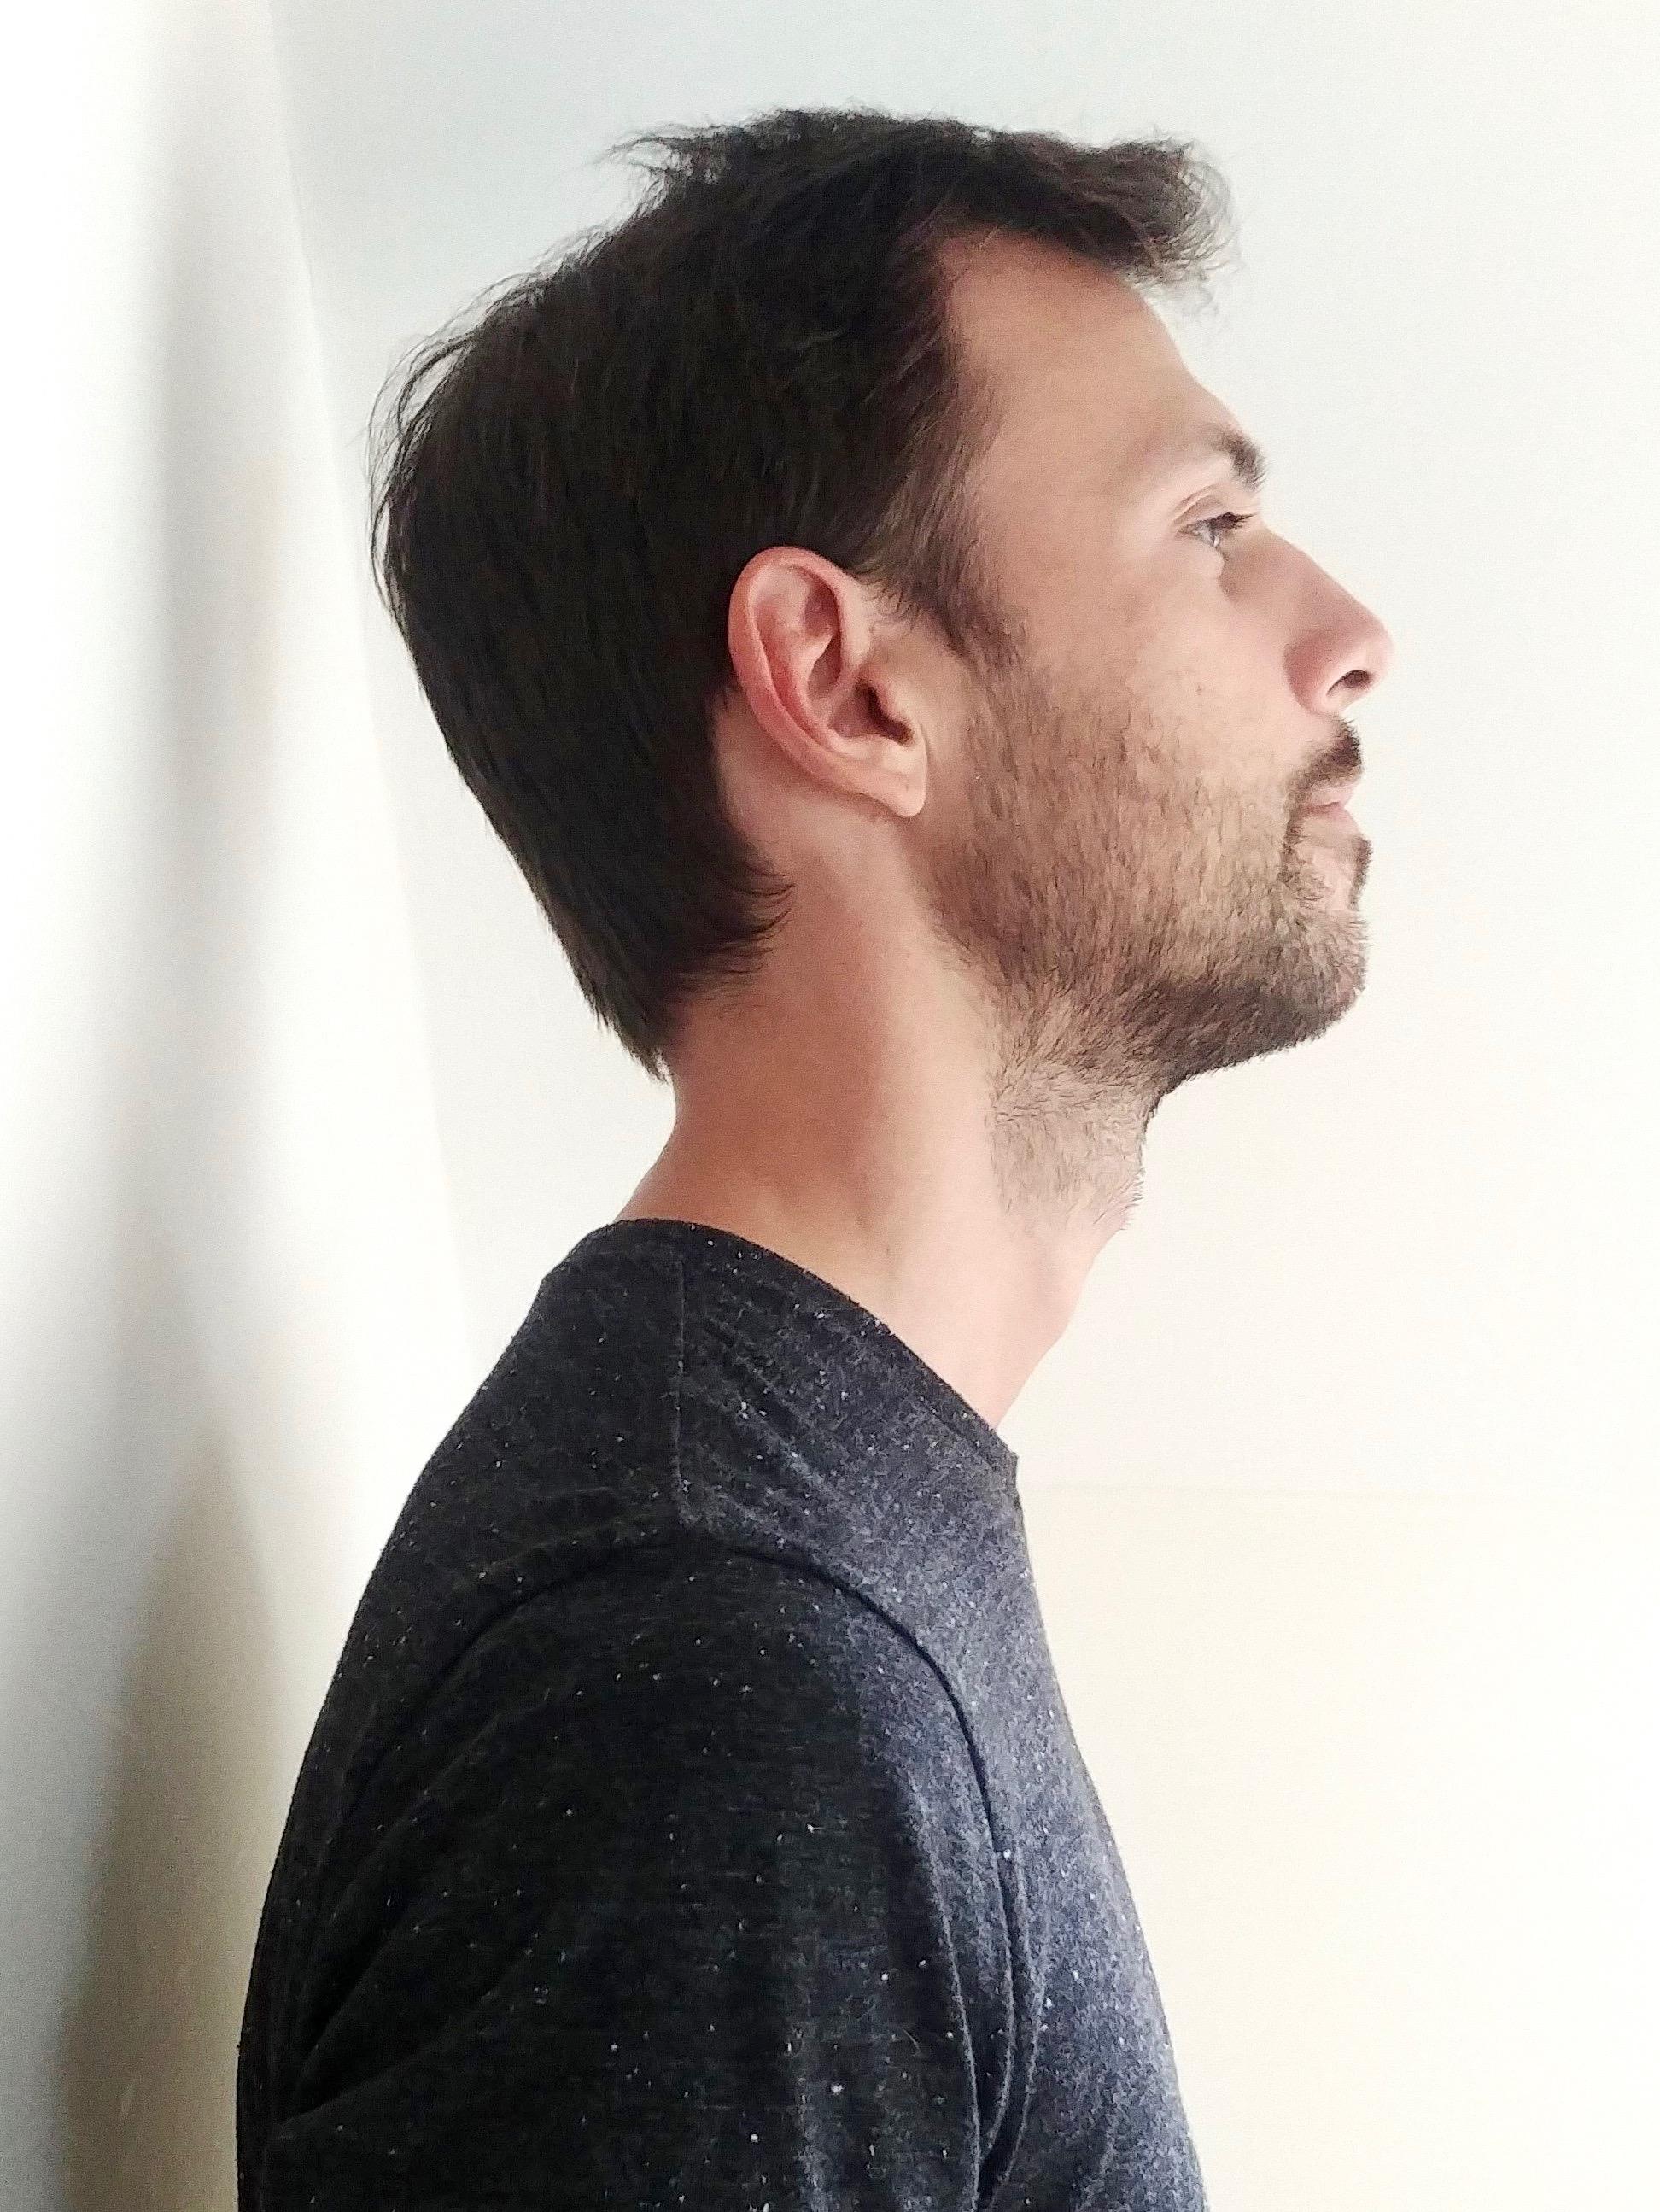 Better posture, chin up image